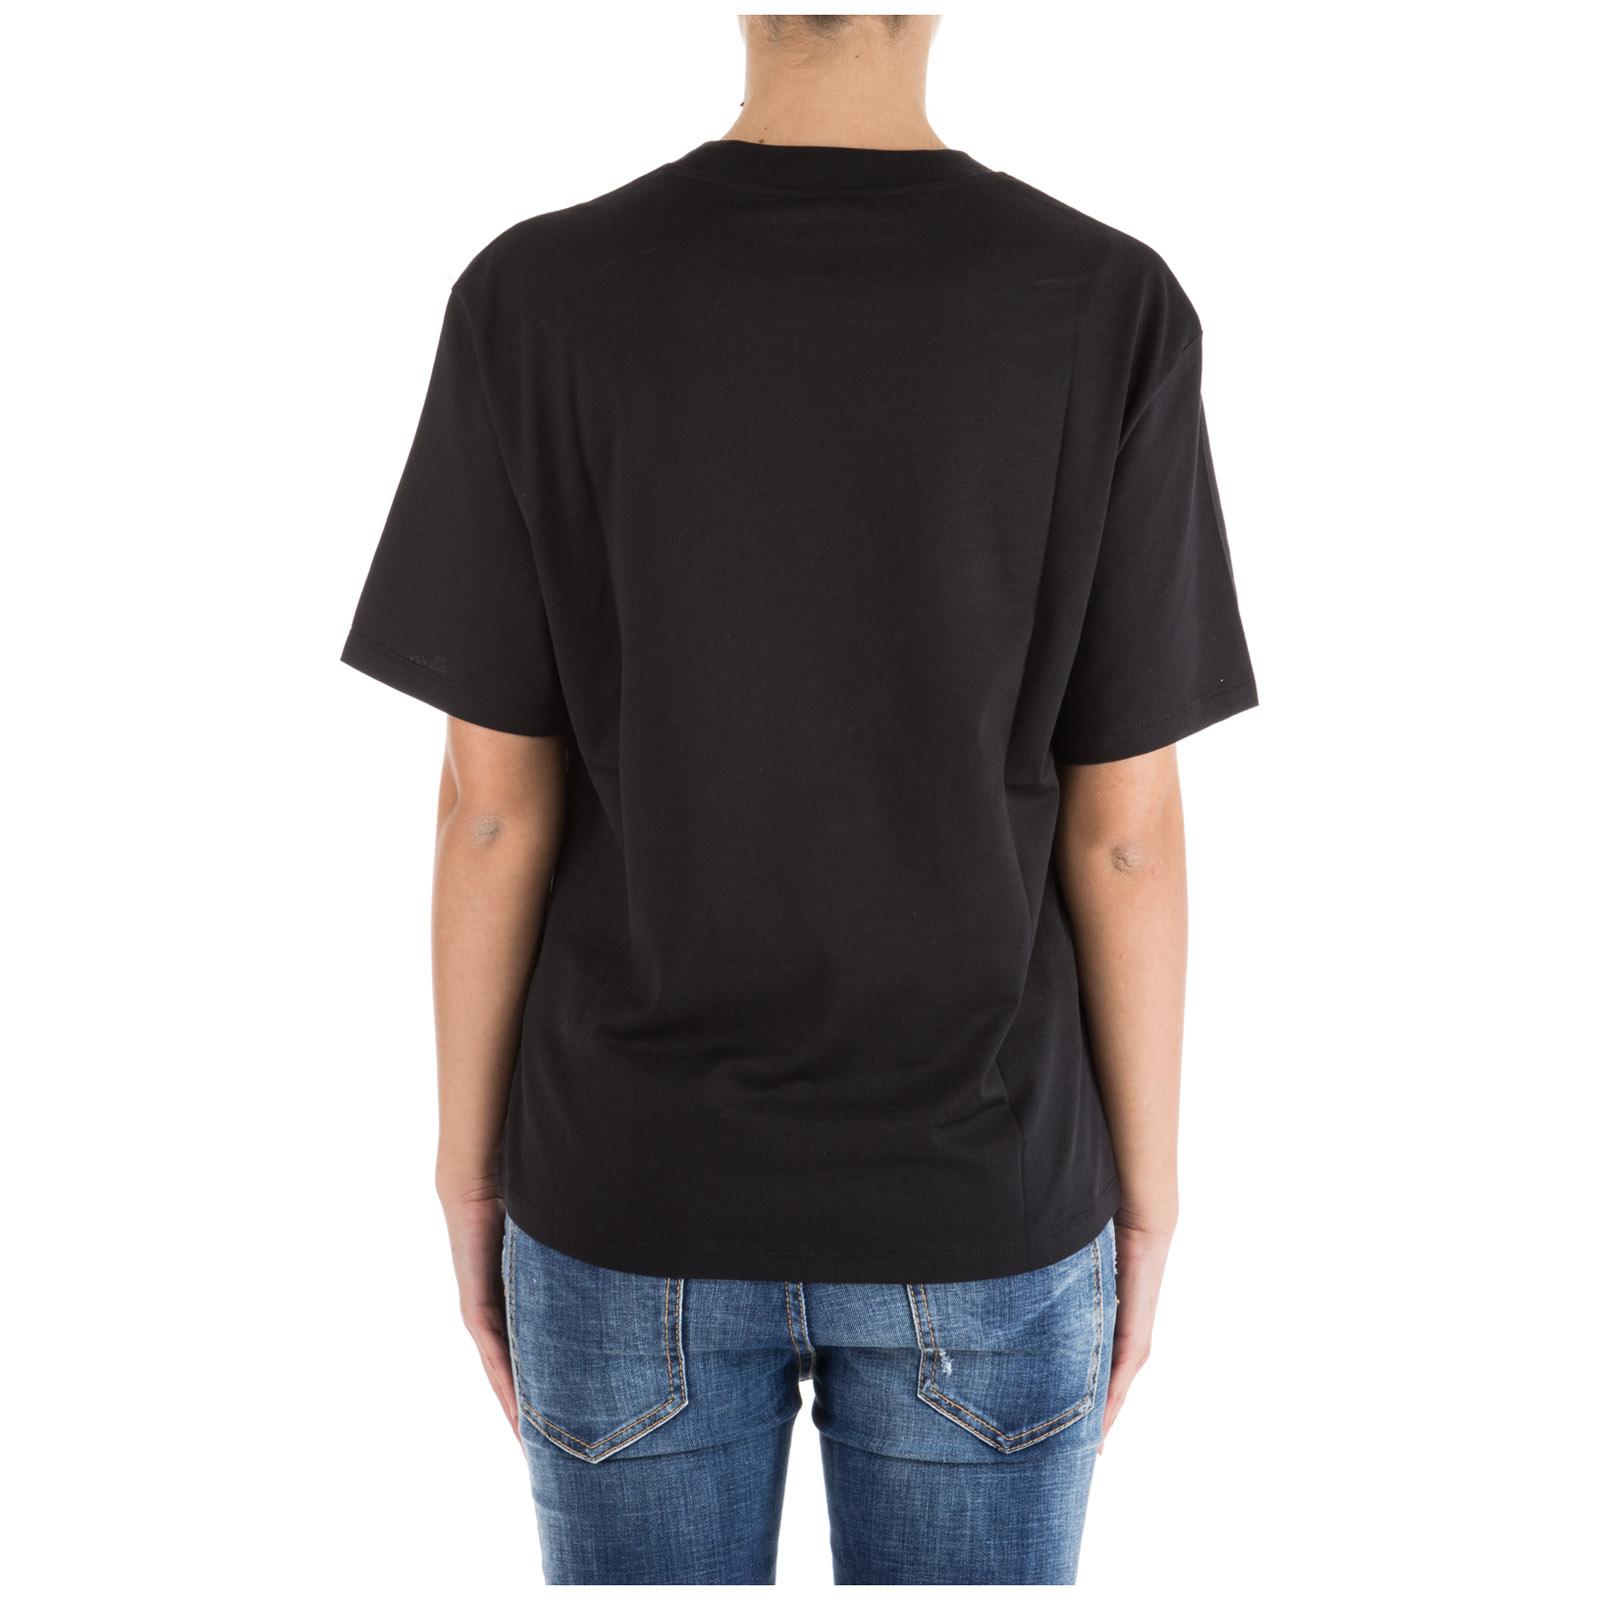 Women's t-shirt short sleeve crew neck round bernina